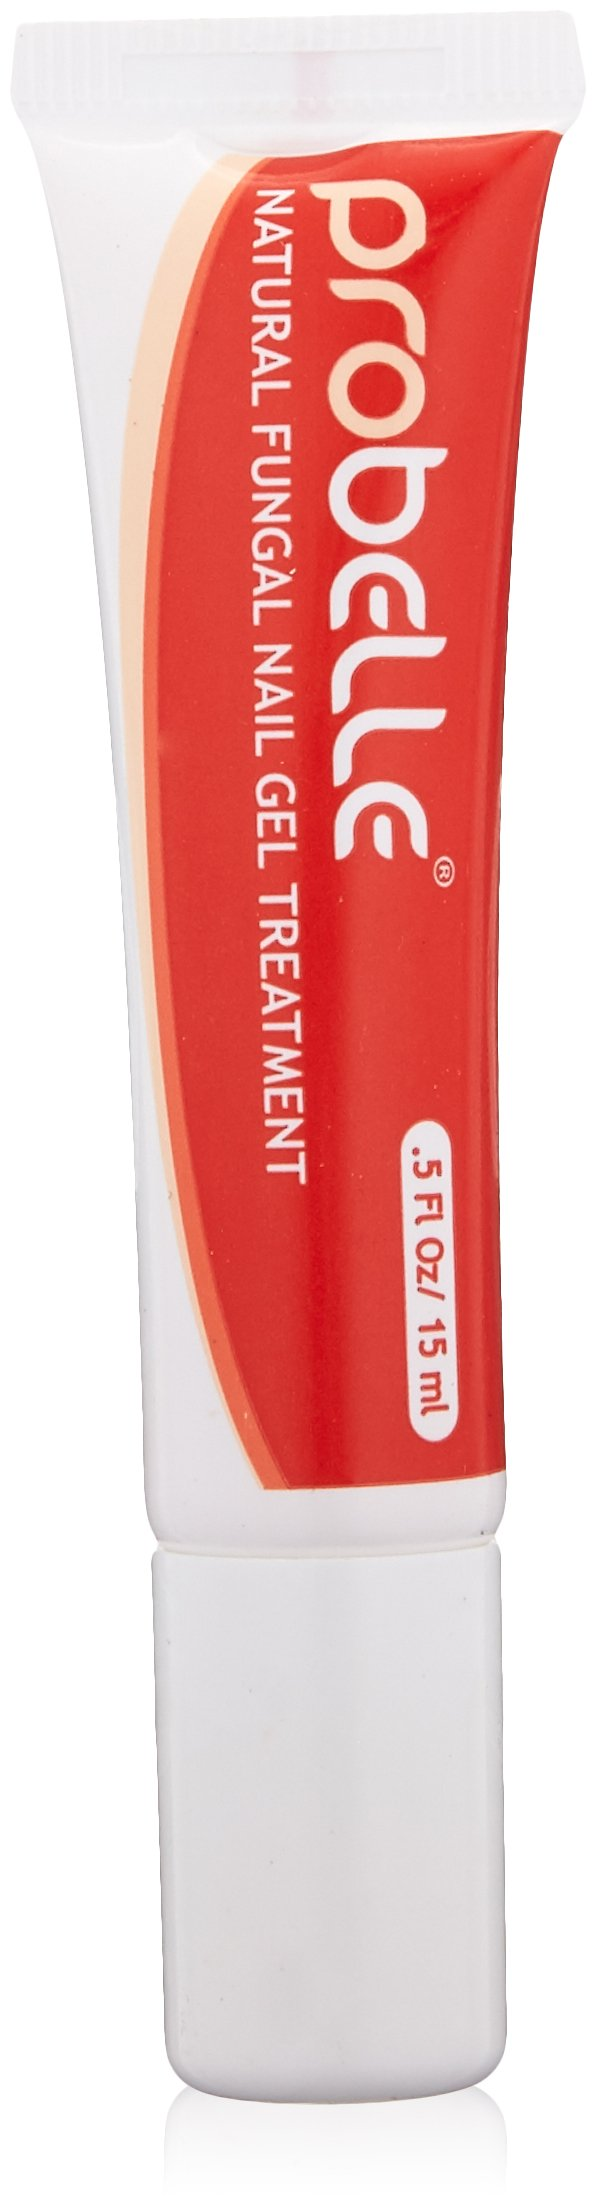 "Probelle ""Extra Strength"" Natural Fungal Nail Gel Treatment, Anti Fungus Nail Treatment, Restores Toenail Fungus, Clear, .5 oz/ 15mL (Patented Formula) (3 Pack)"